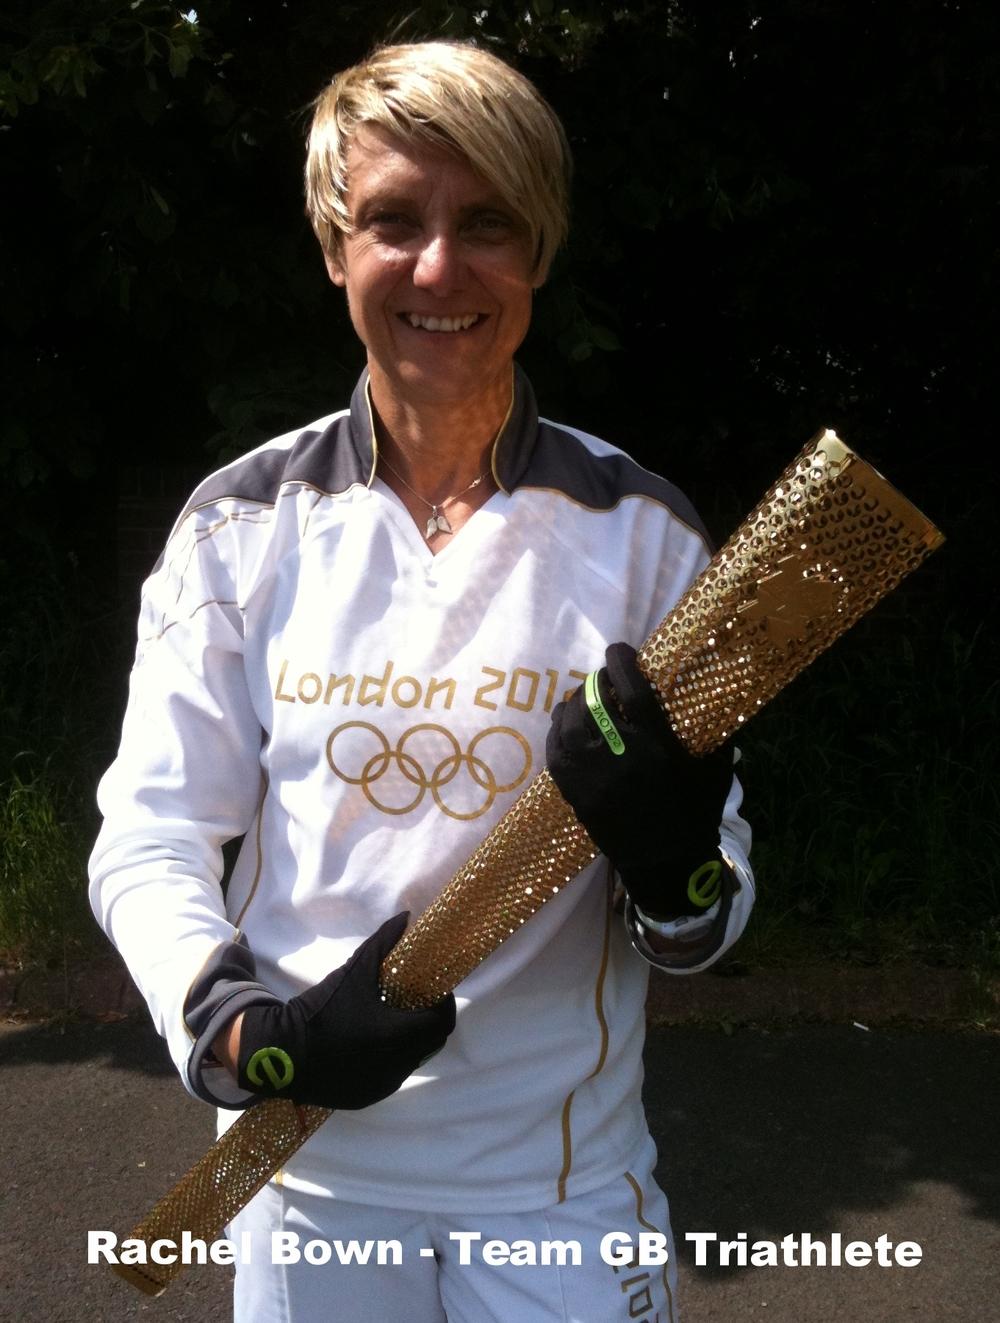 Rachel Bown - Triathlete GB